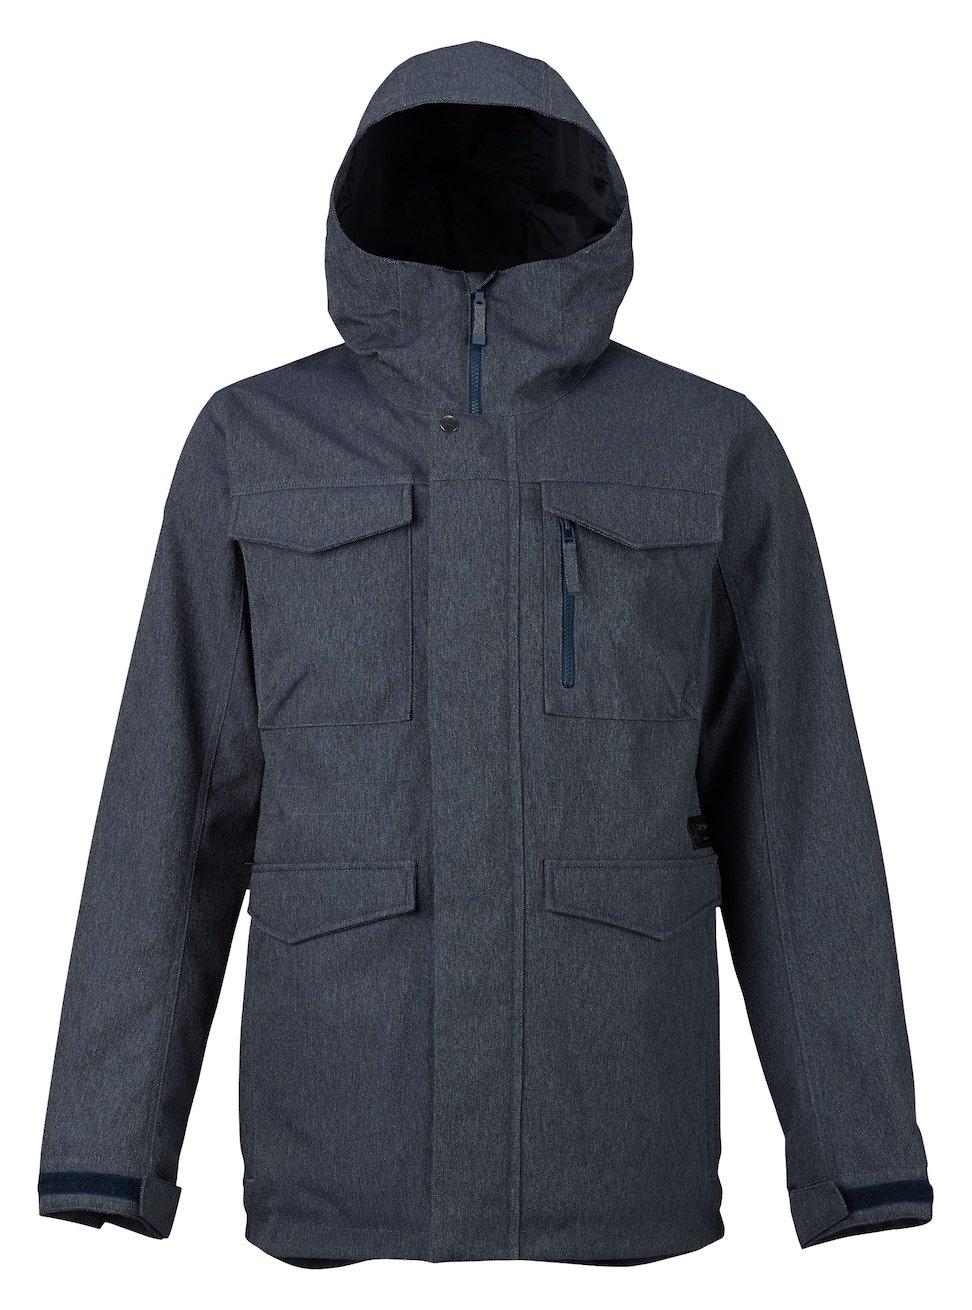 Burton Men's Covert Jacket, Denim, XX-Small